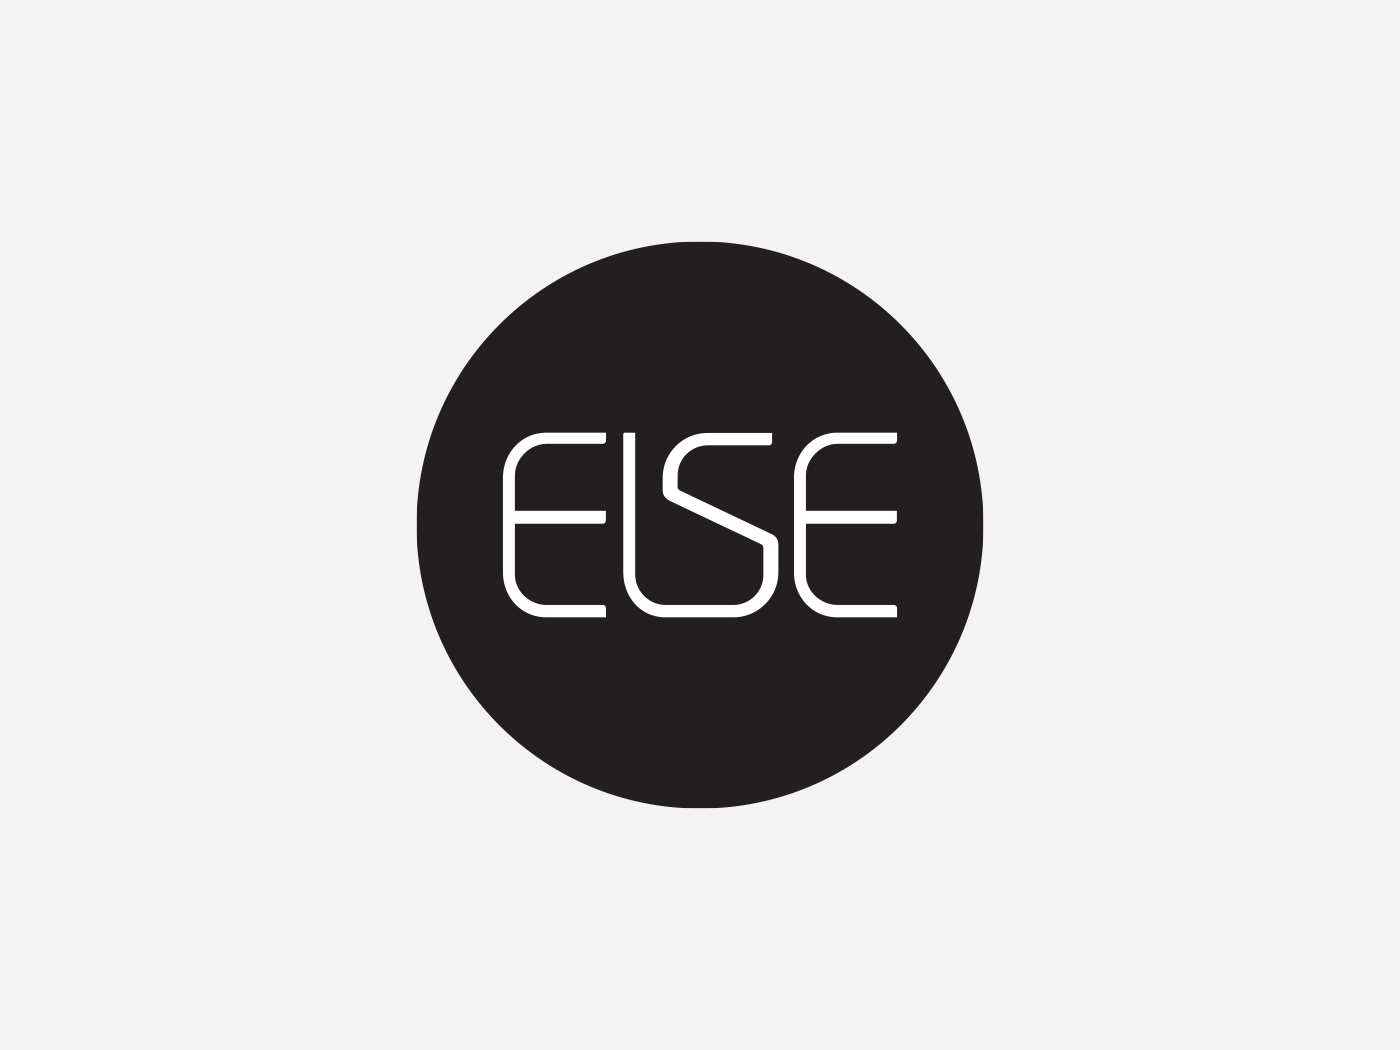 ELSE custom type minimalist web typography icon branding logo